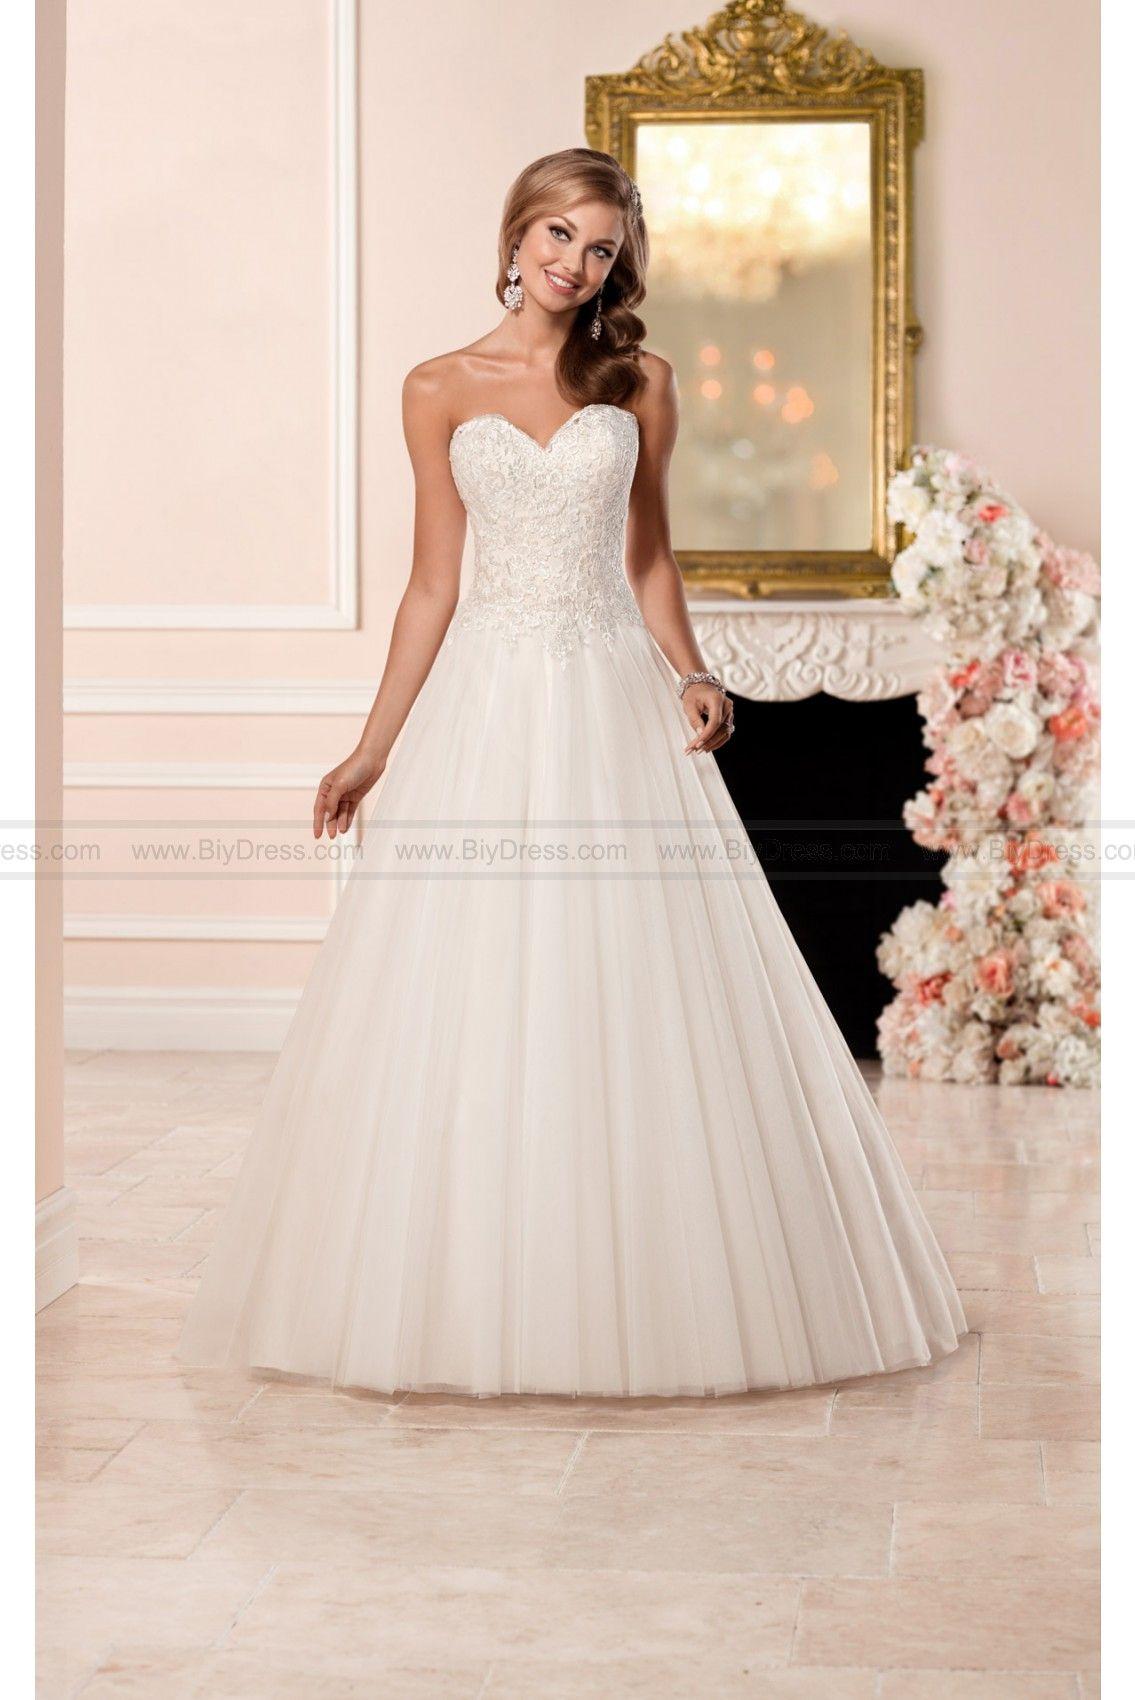 Stella york aline wedding dress with princess cut neckline style